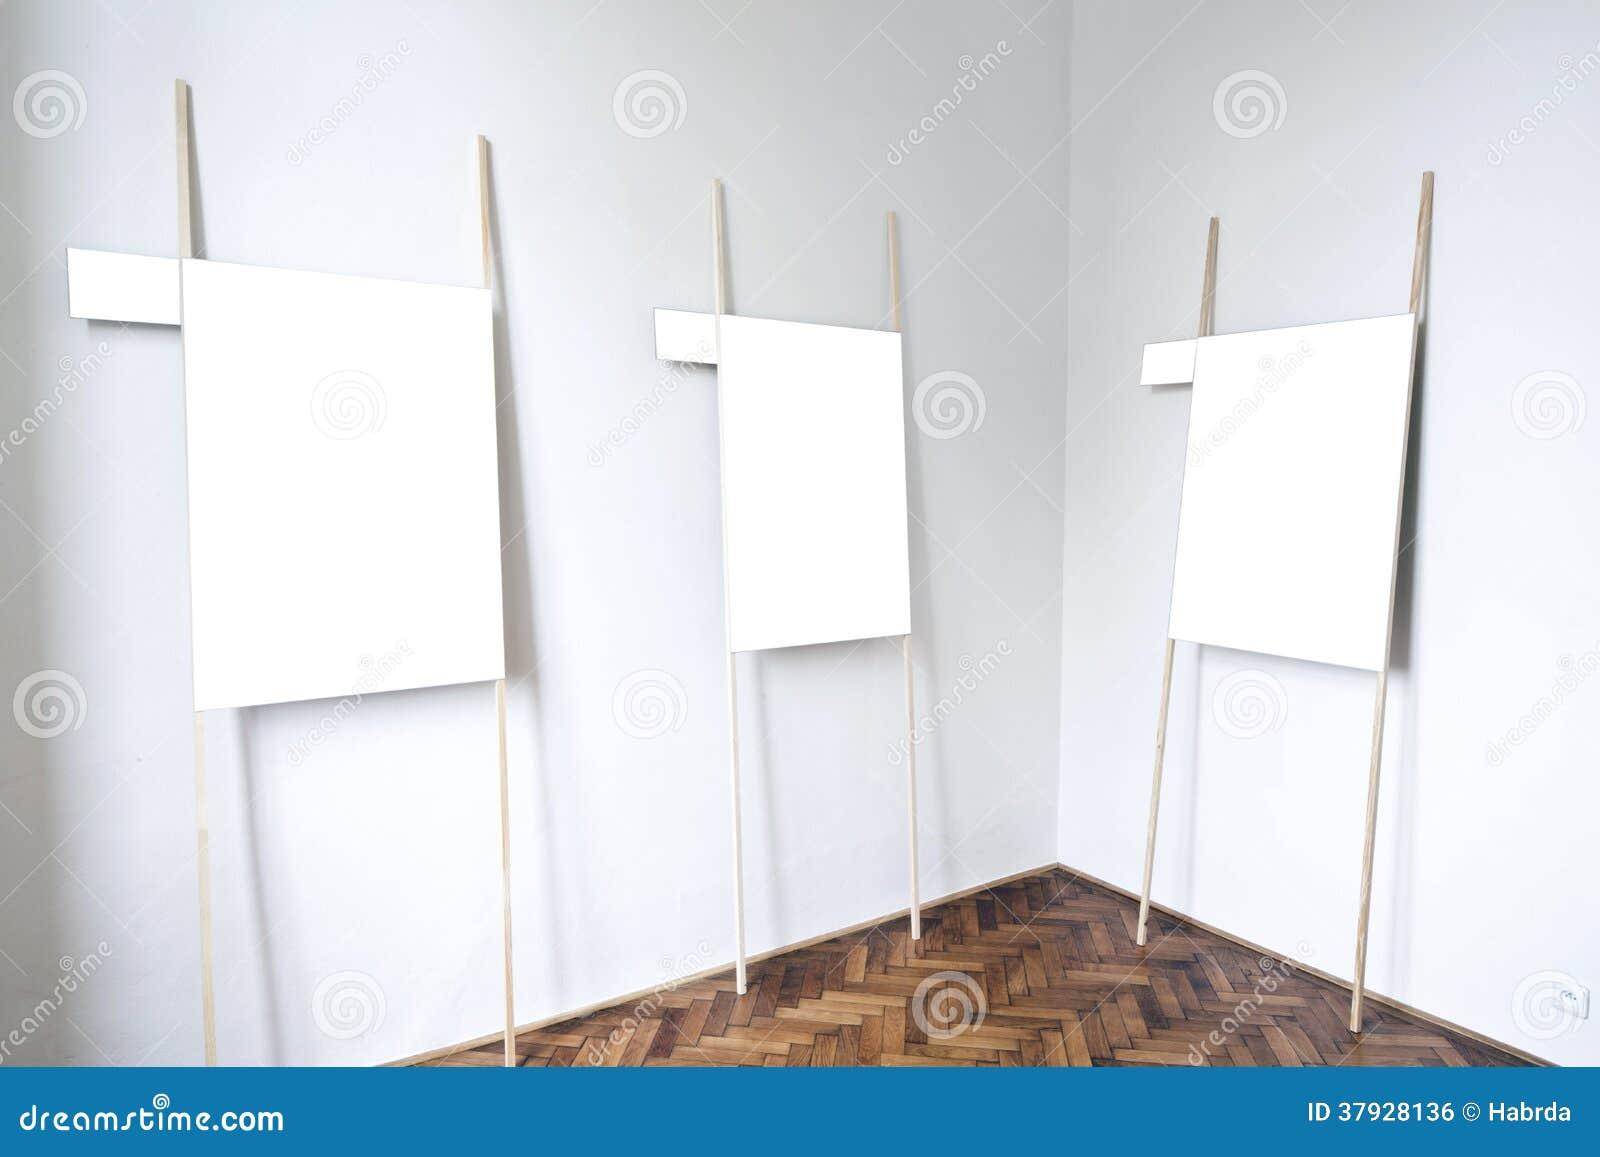 Пустой интерьер галереи